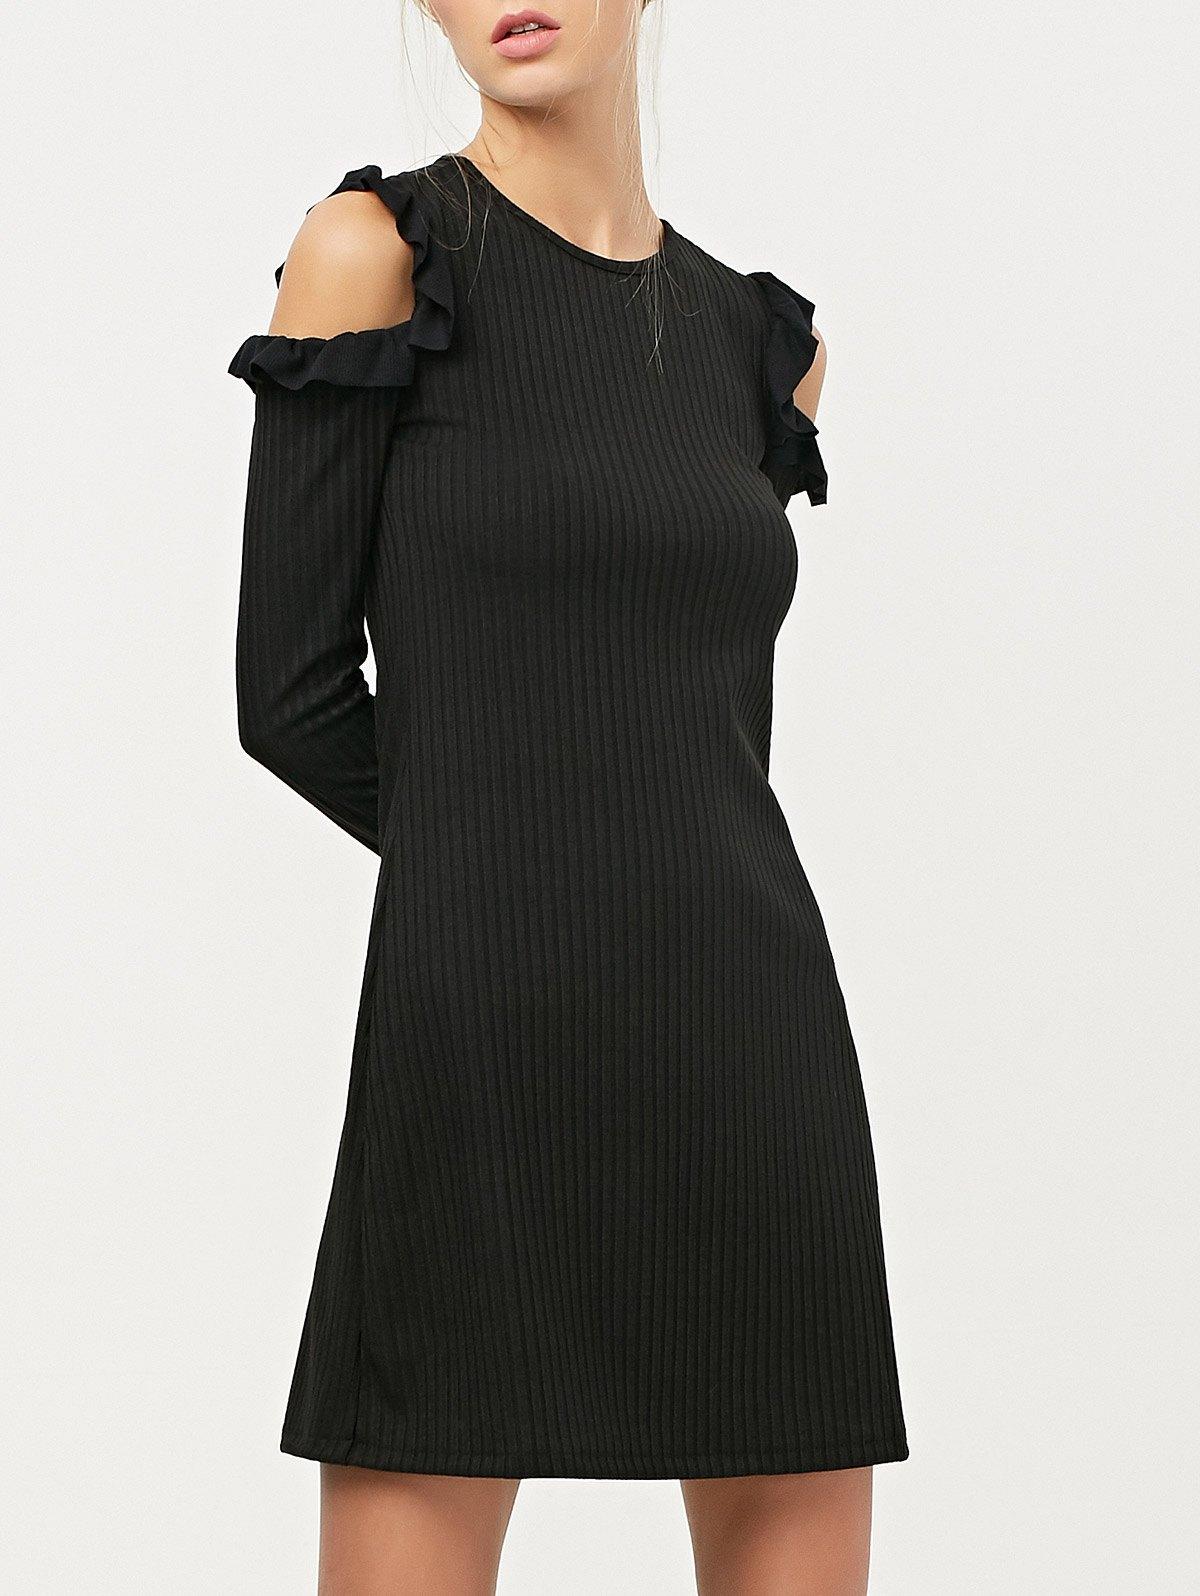 Open Shoulder Long Sleeve A-Line Dress